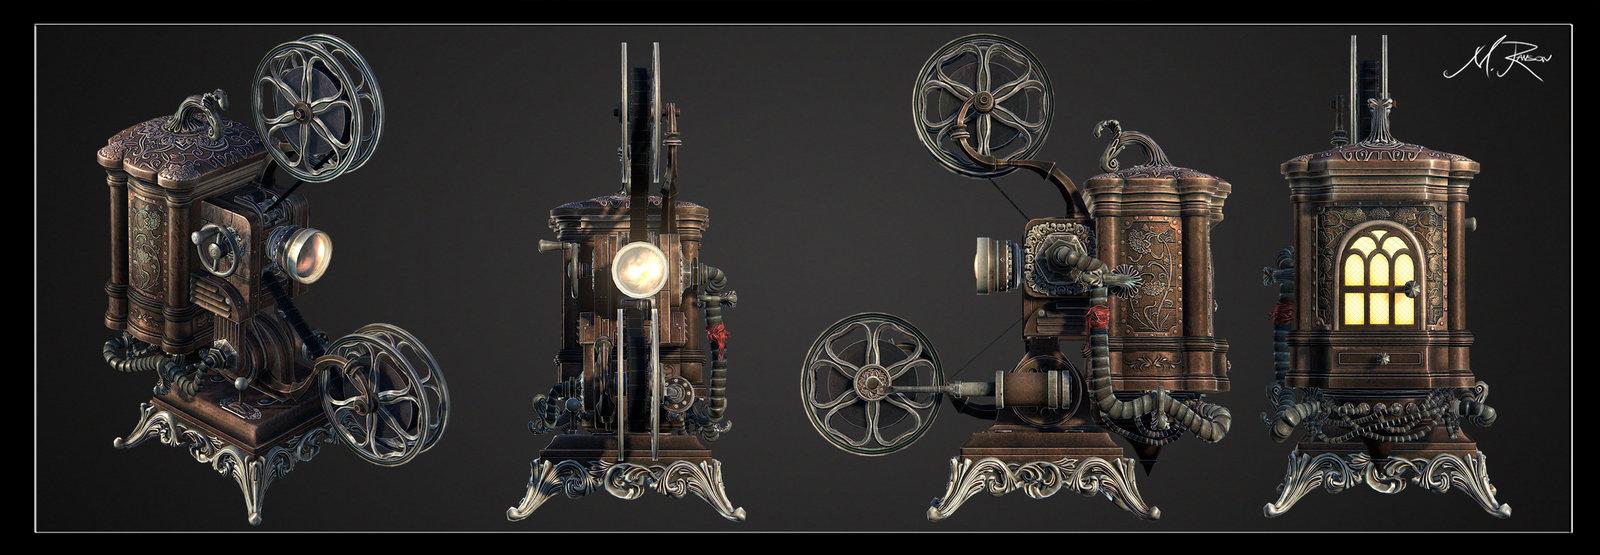 Steampunk Ampro Projector 2012